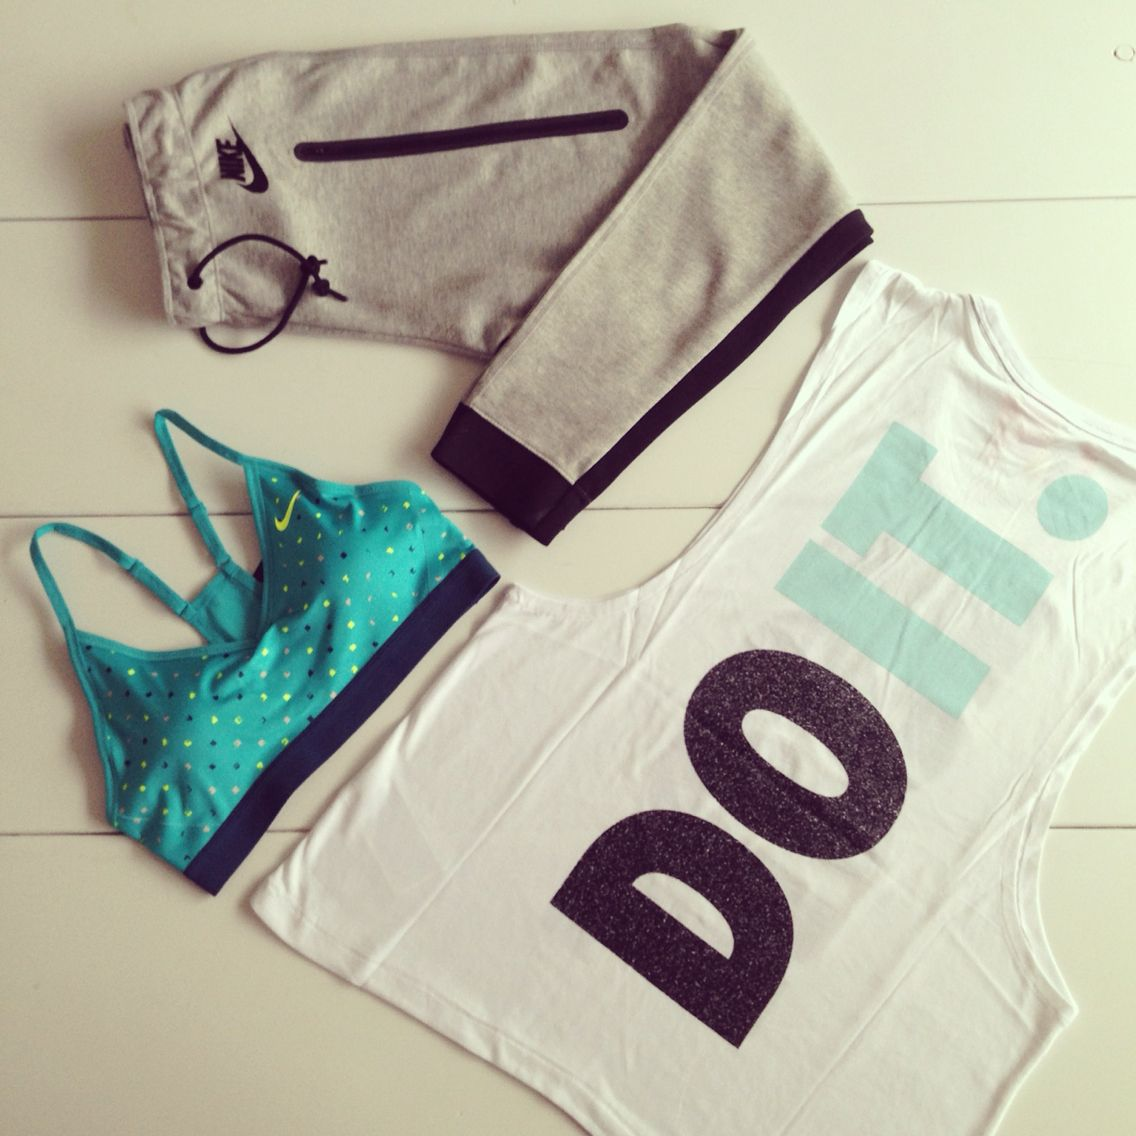 New stuff! #nike #nikewomen #sportswear #gear #turqoise #essentials #training #motivation